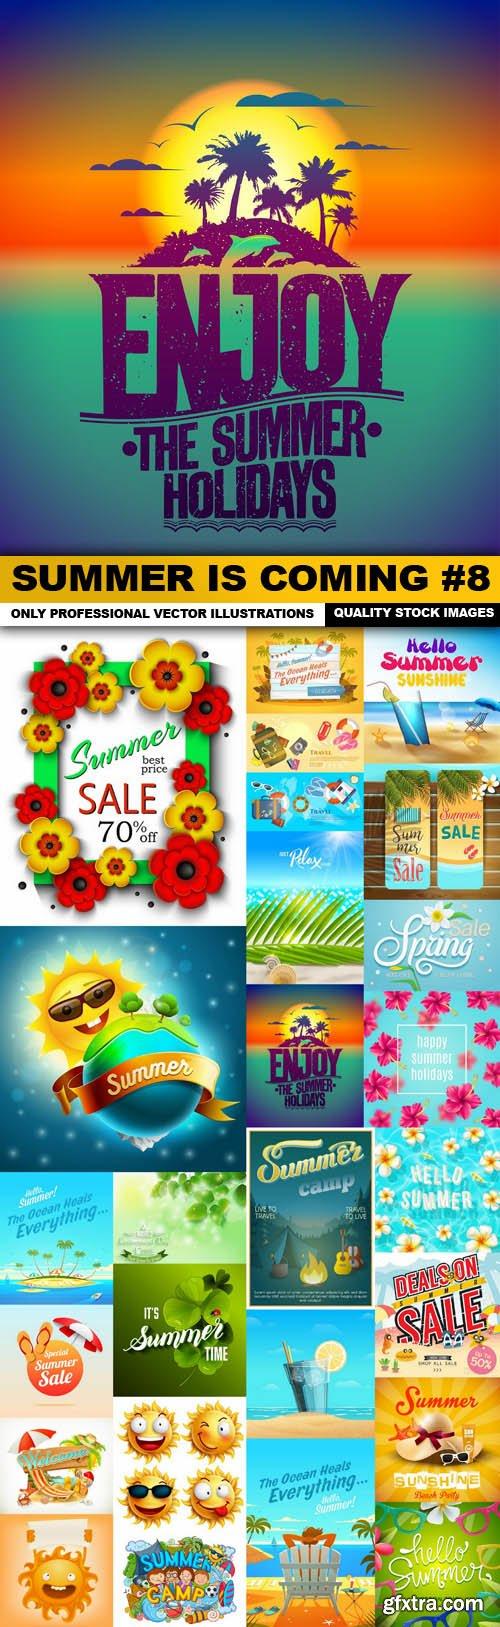 Summer Is Coming #8 - 25 Vector